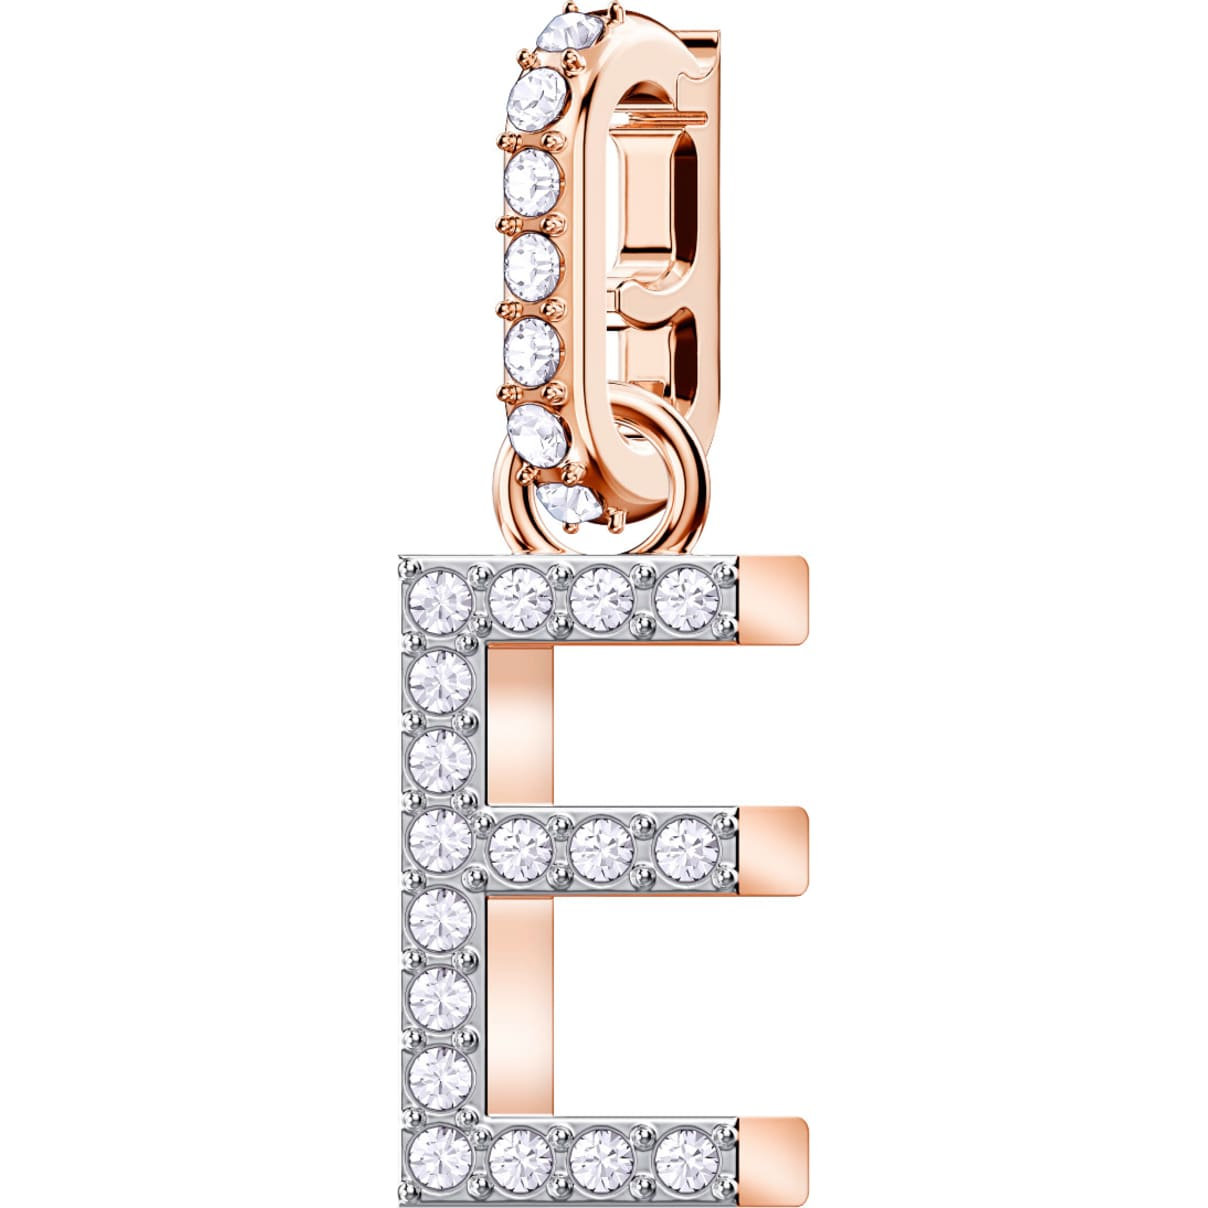 Swarovski Swarovski Remix Collection Charm E, White, Rose-gold tone plated